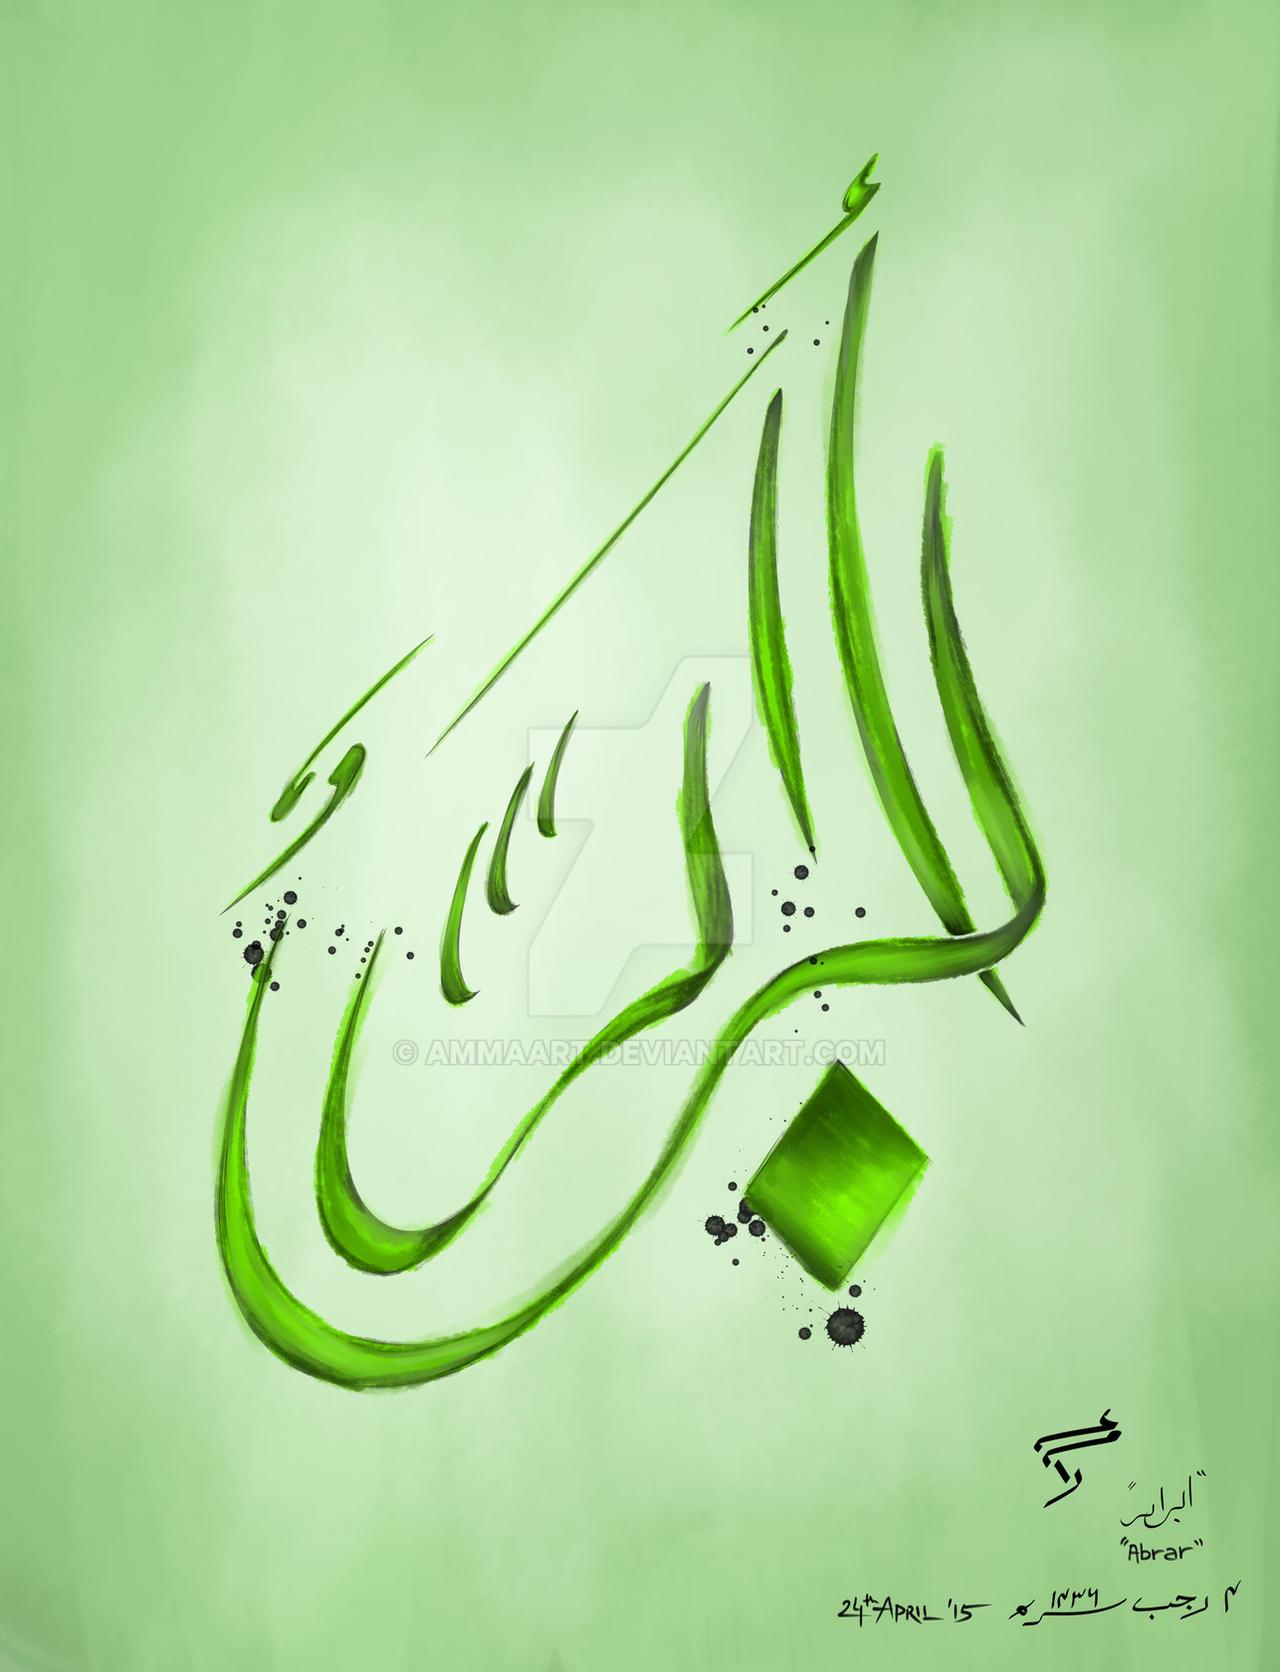 Simple Wallpaper Name Arabic - abrar_by_ammaart-d8r9td3  Gallery_682886.jpg